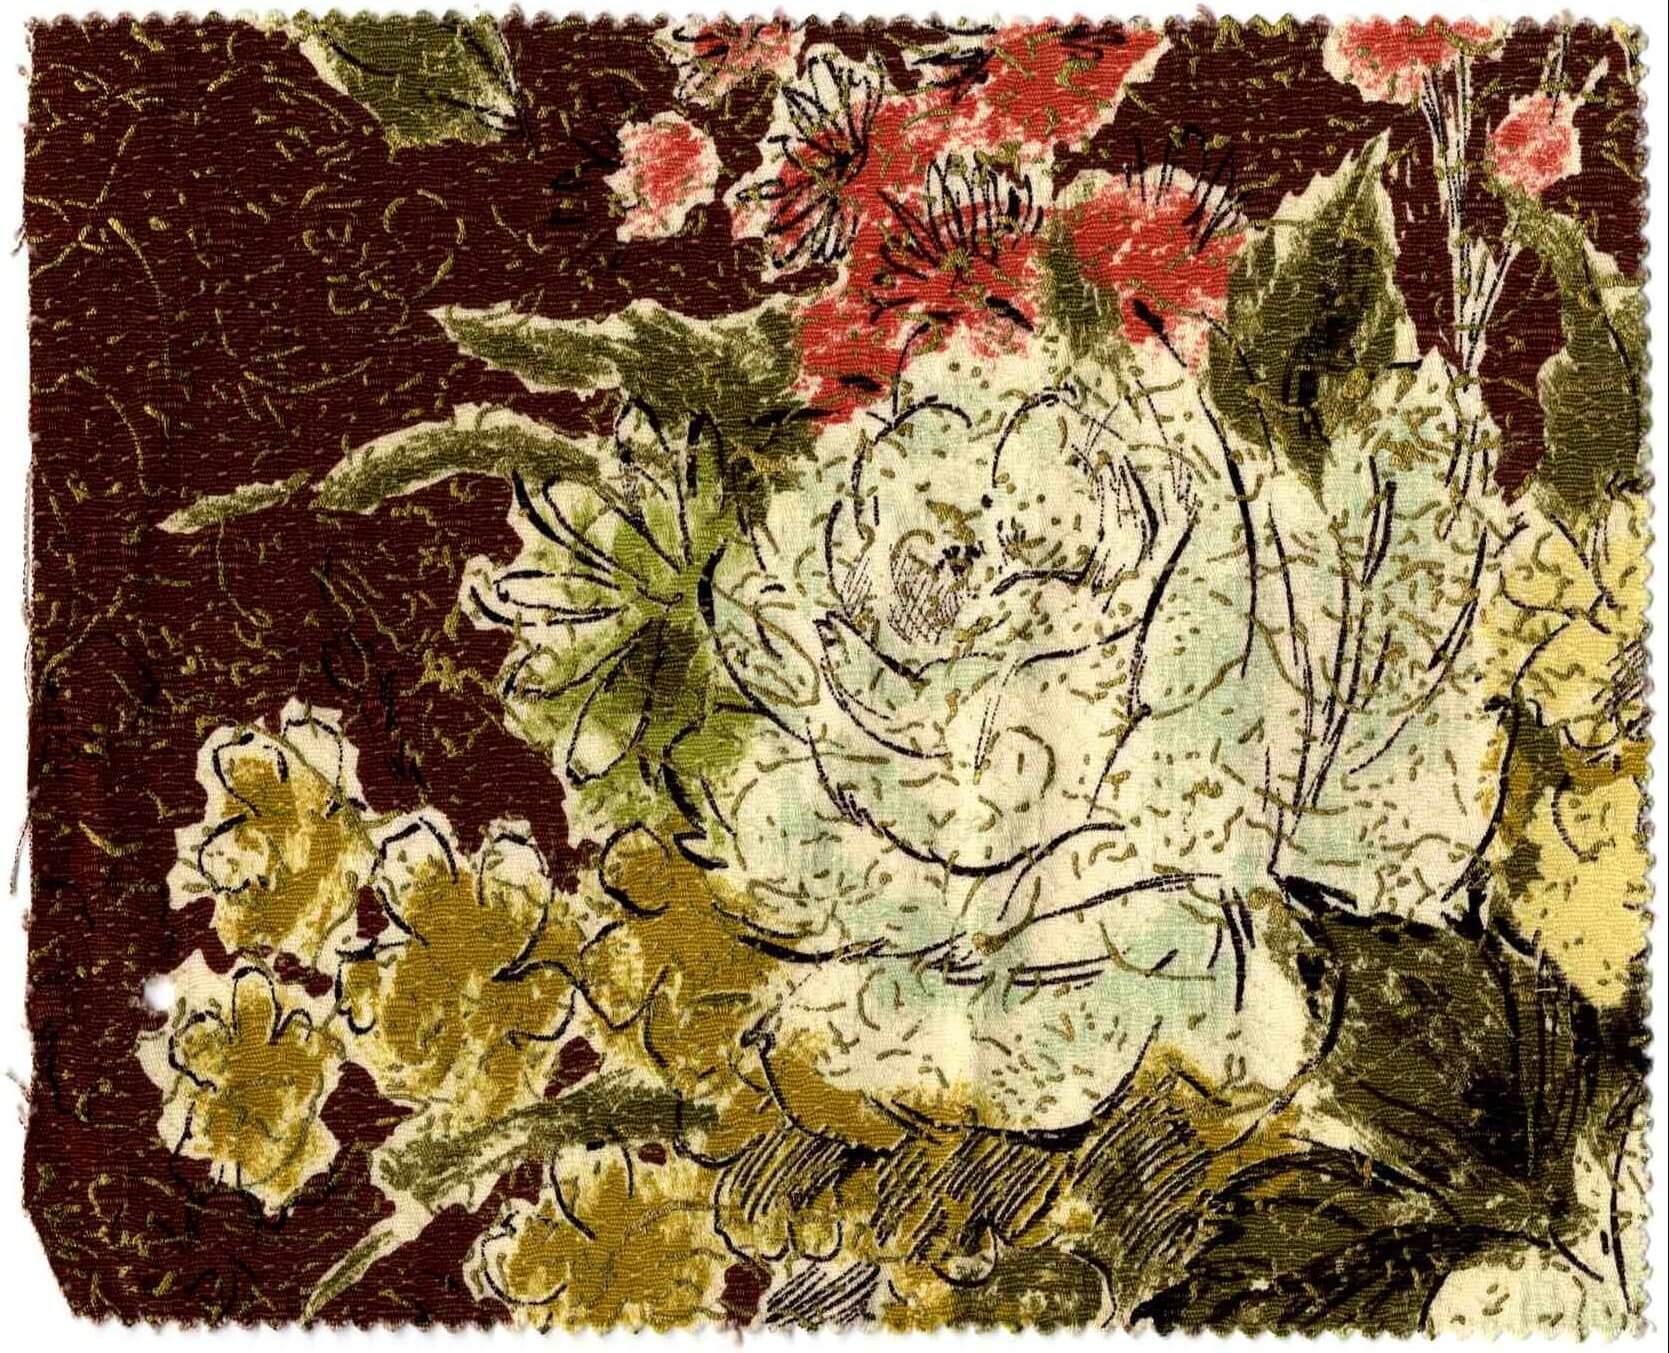 waverly-vintage-rhino-cloth-spring-frolic-peat-moss